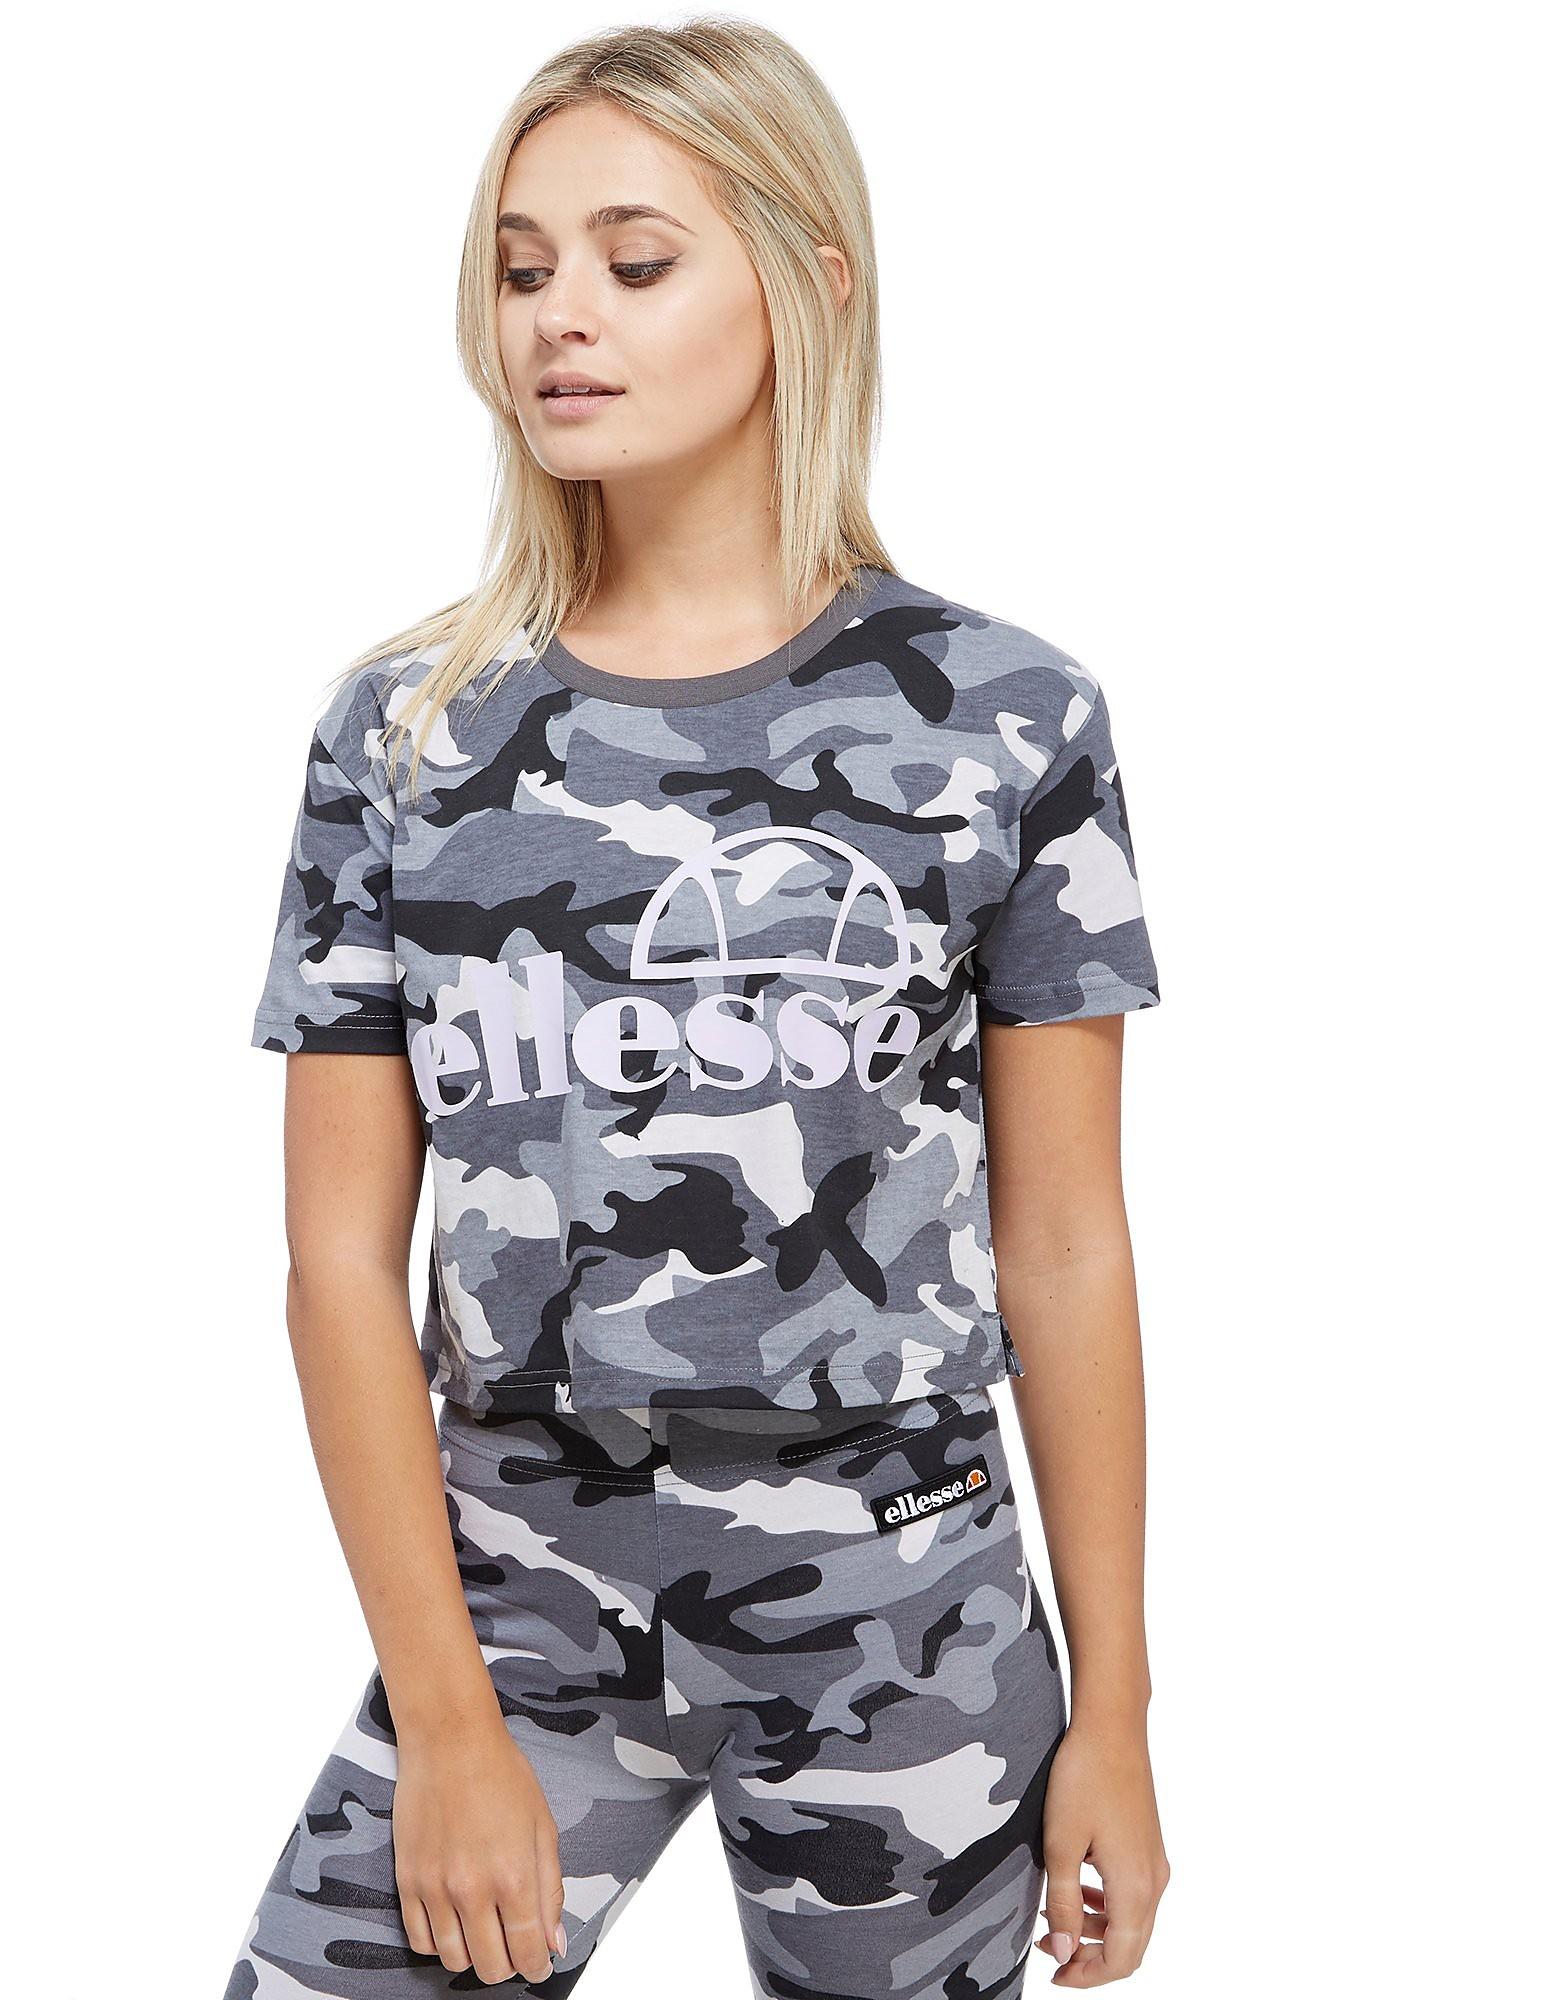 Ellesse Camo Cropped T-Shirt